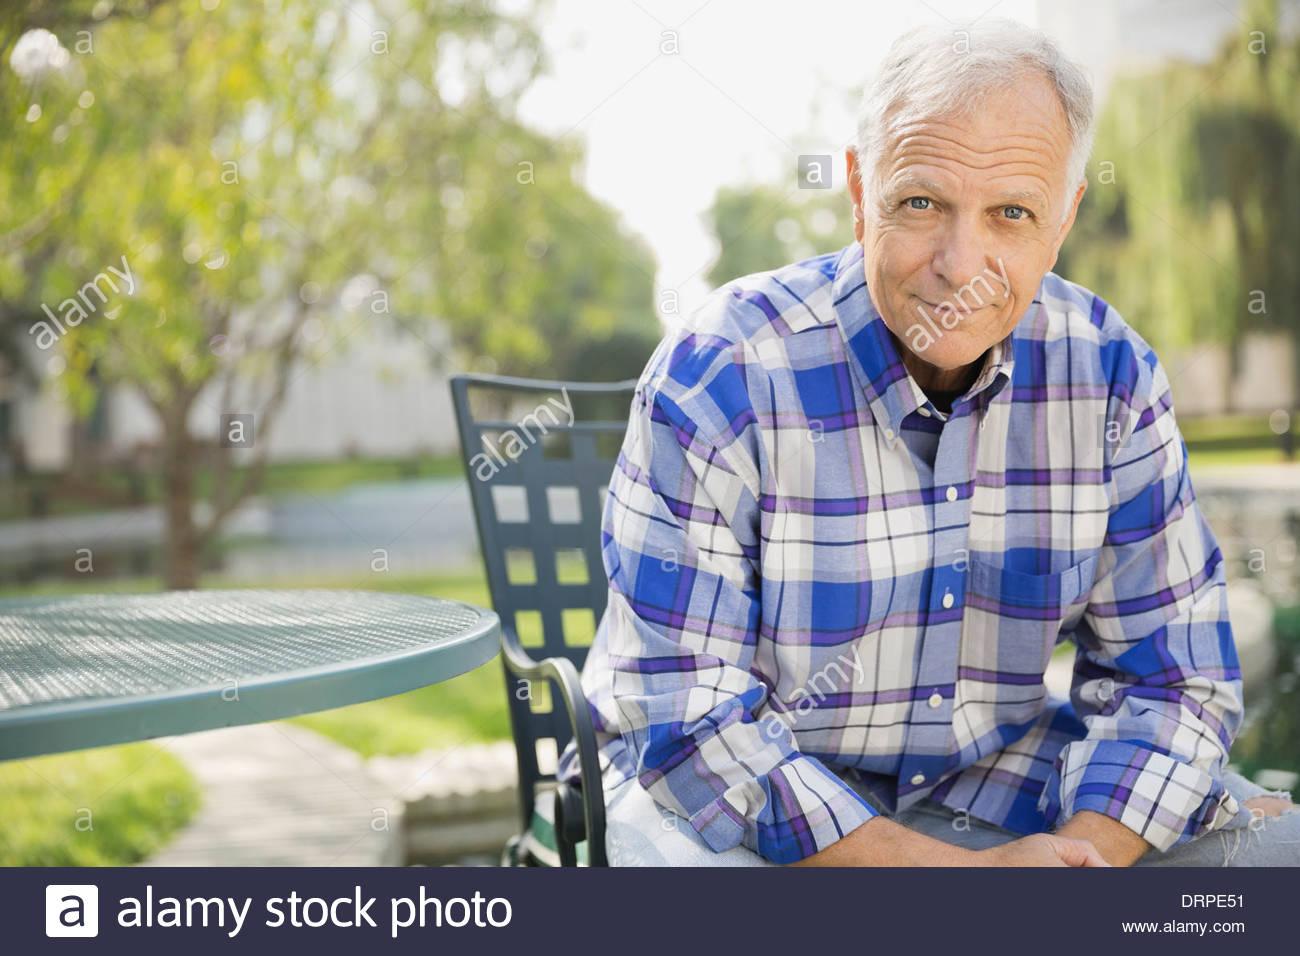 Portrait of senior man sitting outdoors Photo Stock